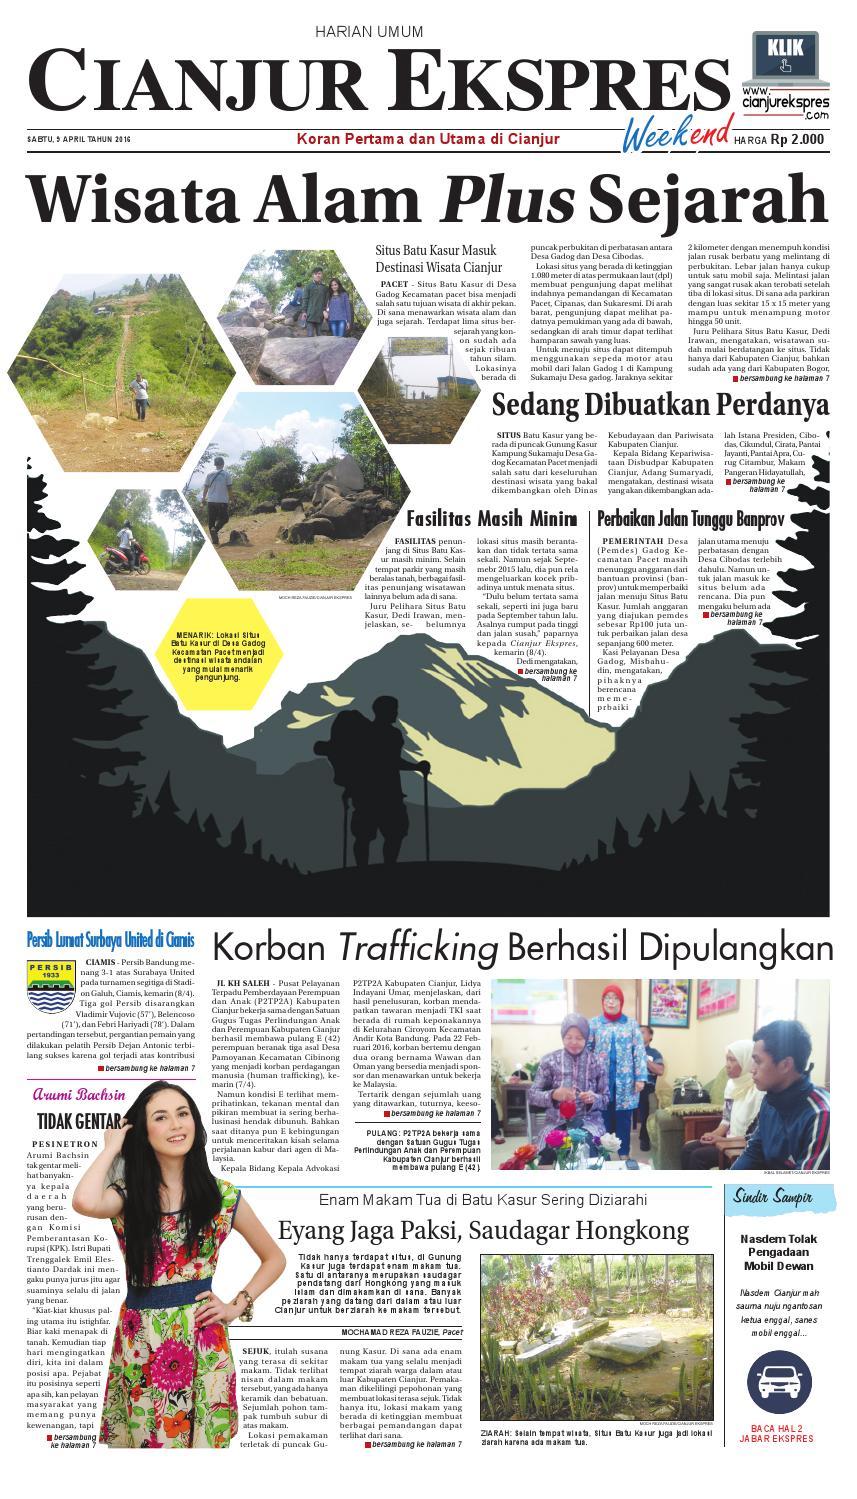 Cianjur Ekspres 9 April 2016 By Ricky Ari Issuu Kuliner Sambel Bawang Kering Khohar Bdg